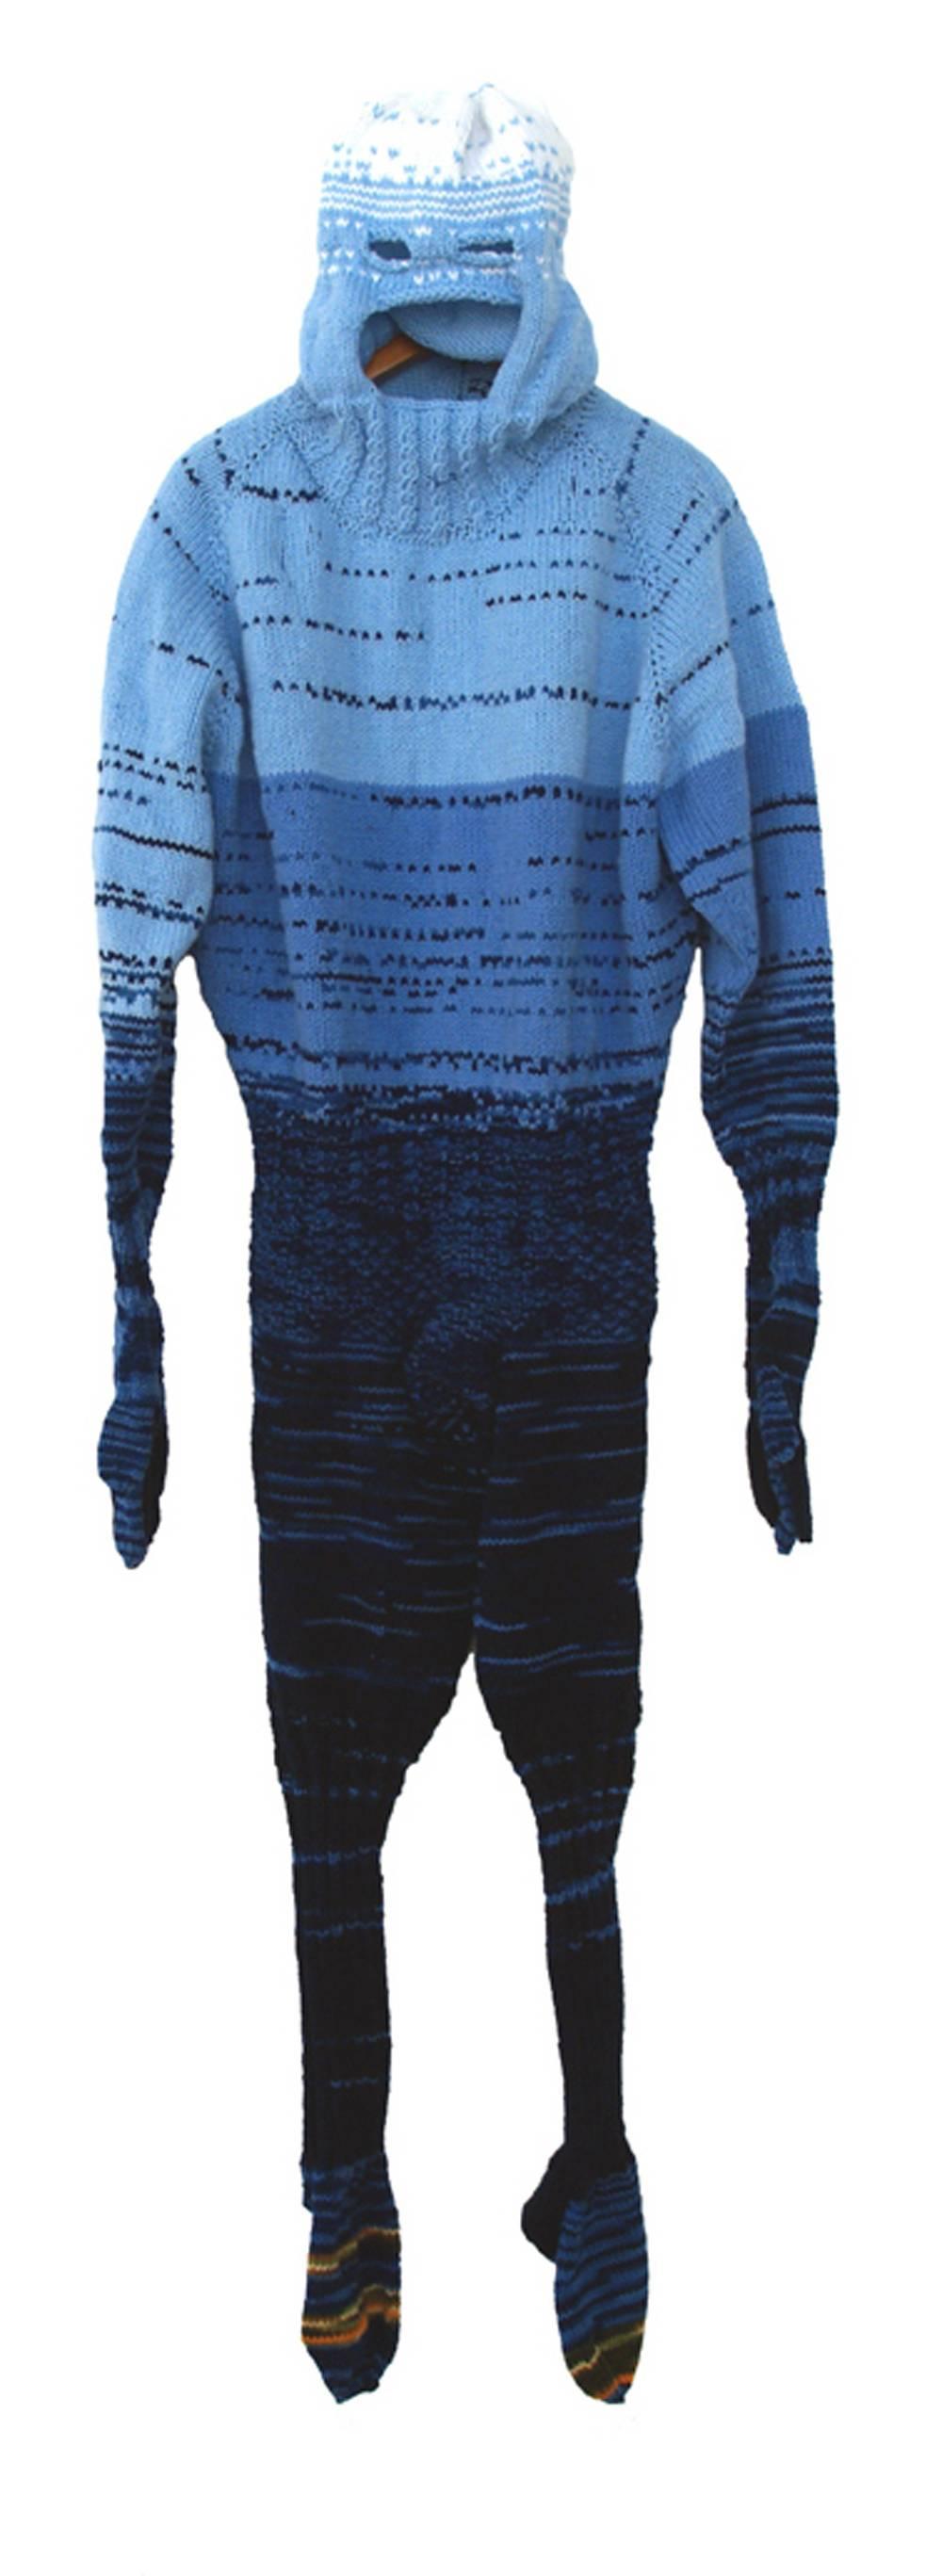 """A-Man"", Contemporary, Mixed Media, Sculpture, Knit, Crochet, Fabric, Fiber"